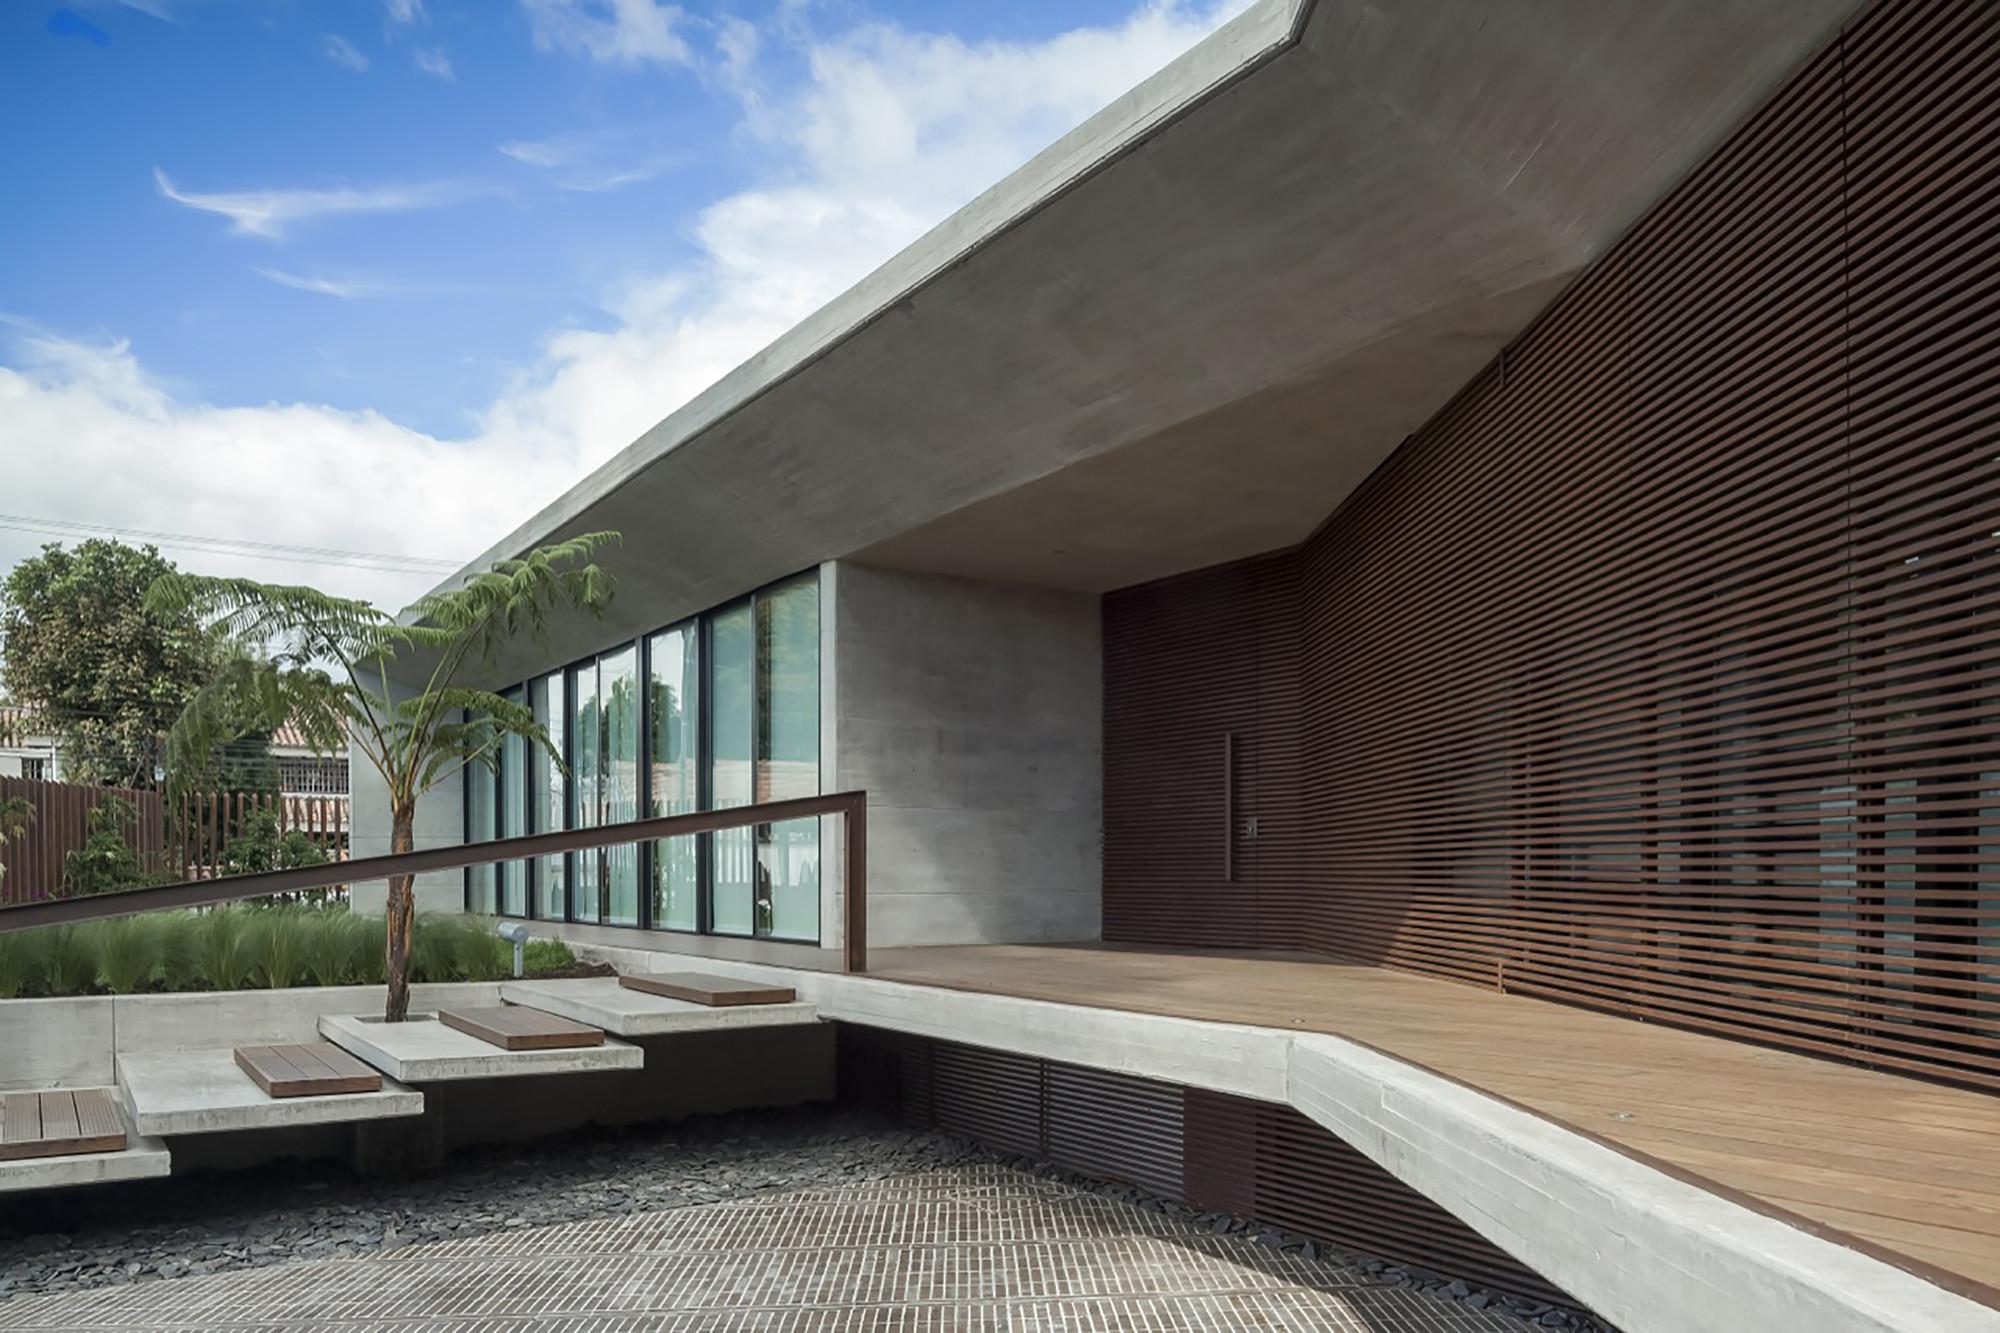 Galeria de casa cr h h arquitectos 11 for Casa de arquitectos